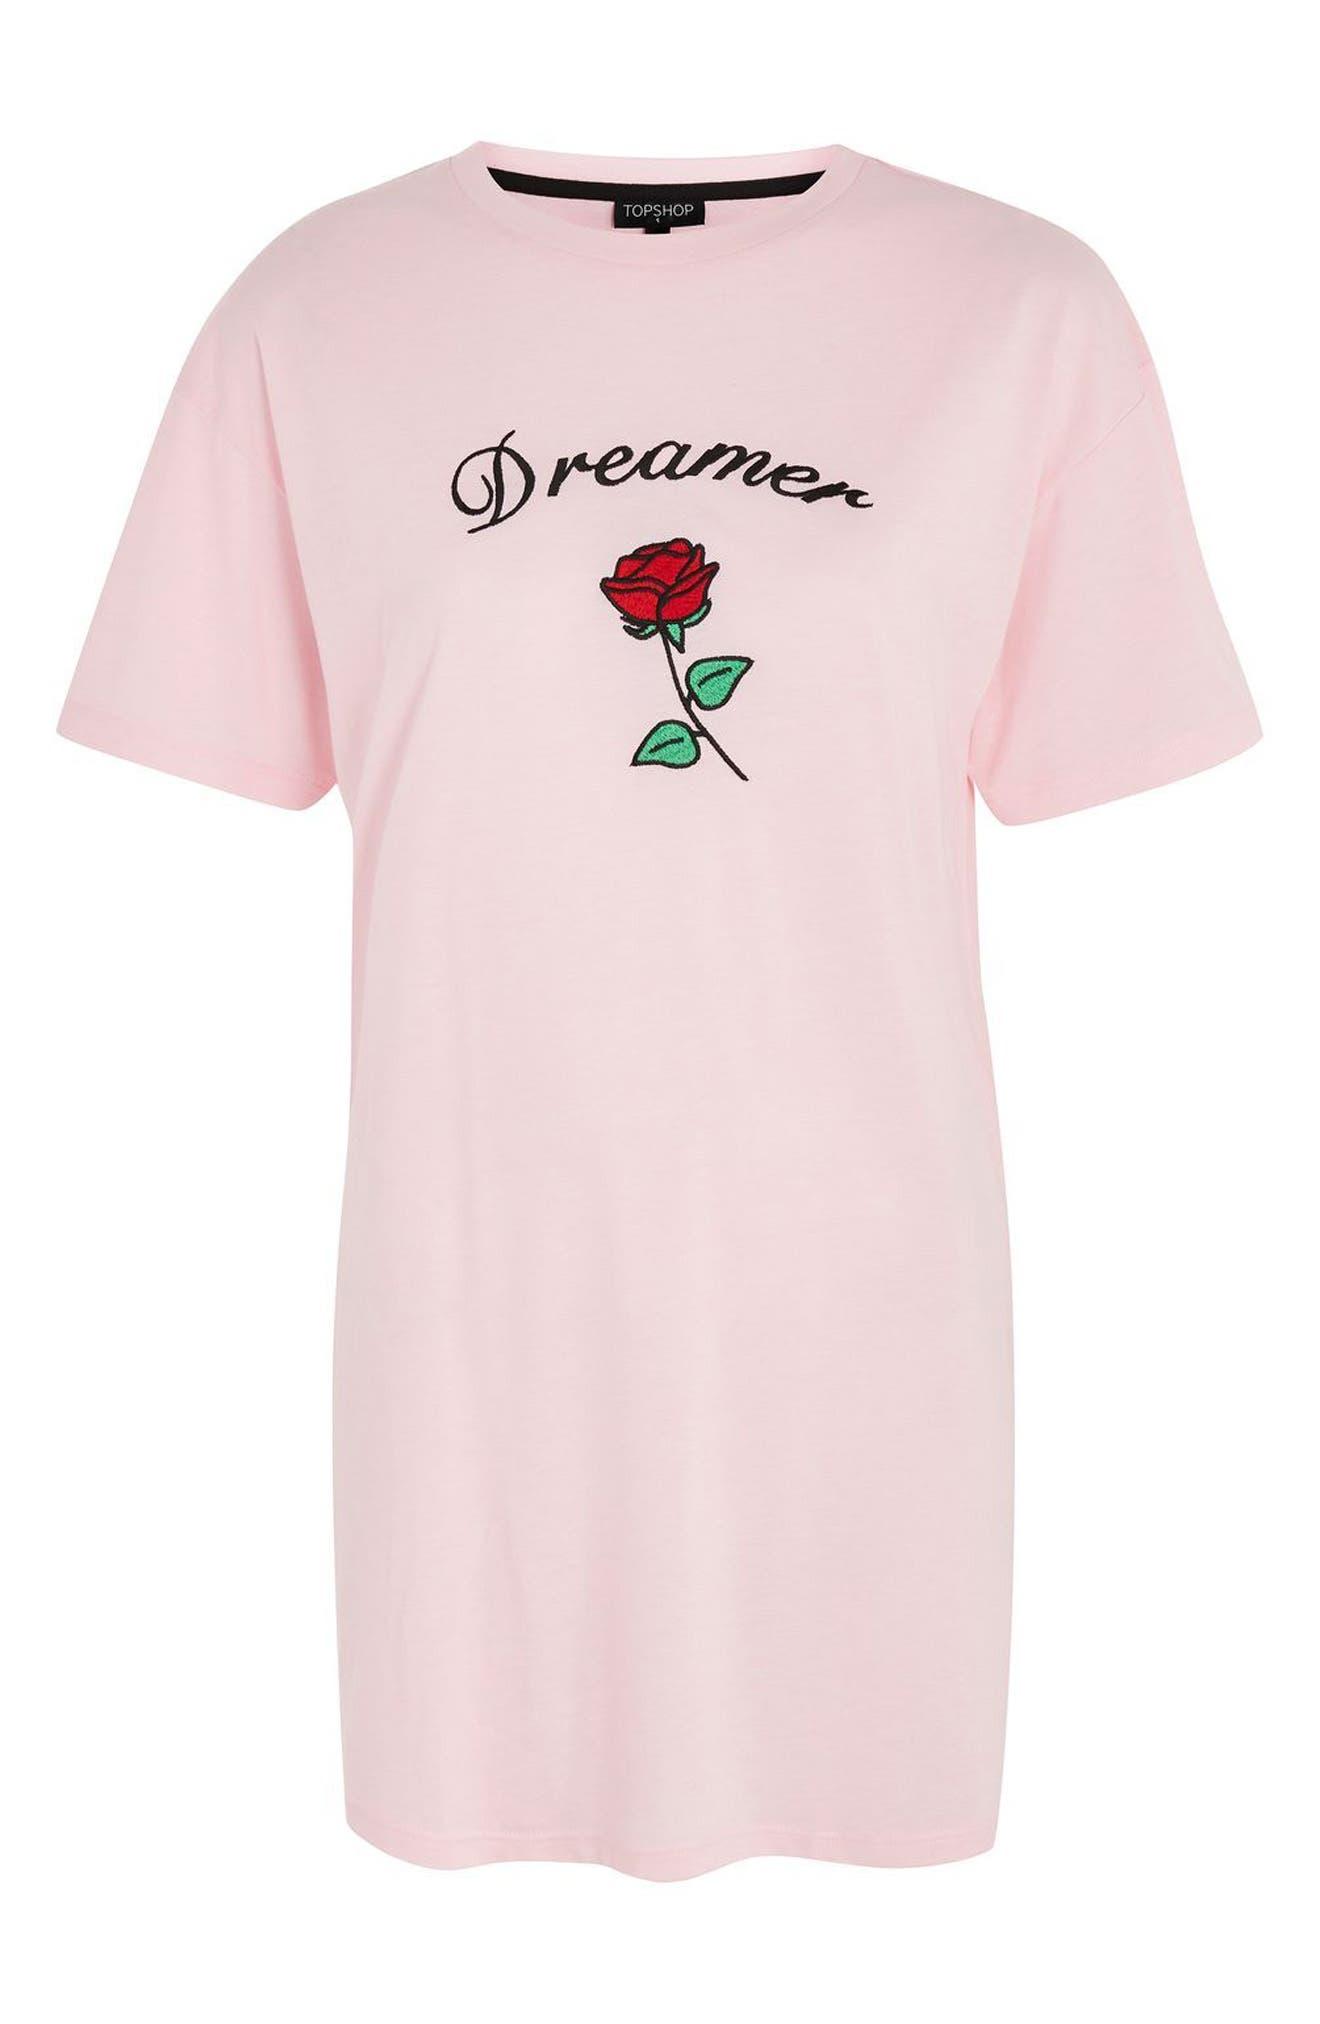 Dreamer Embroidered Sleep Shirt,                             Alternate thumbnail 3, color,